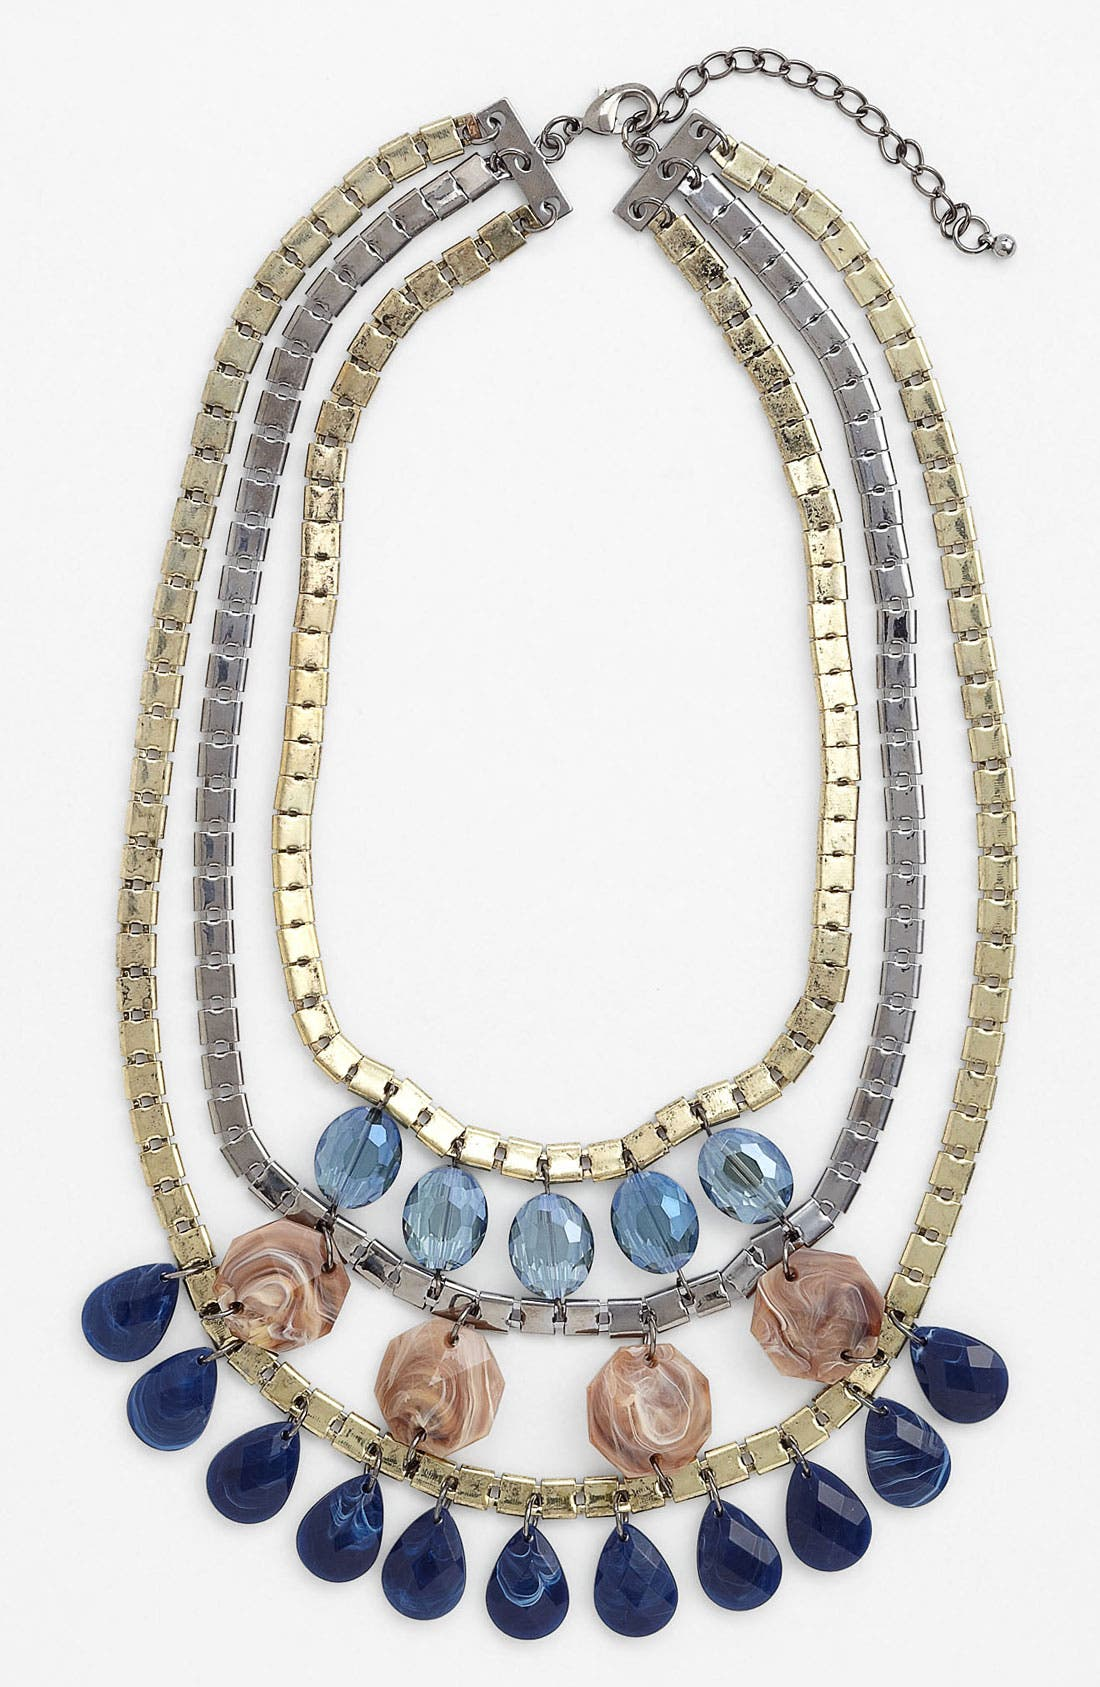 Alternate Image 1 Selected - Panacea 'Blue Drops' Three Tier Necklace